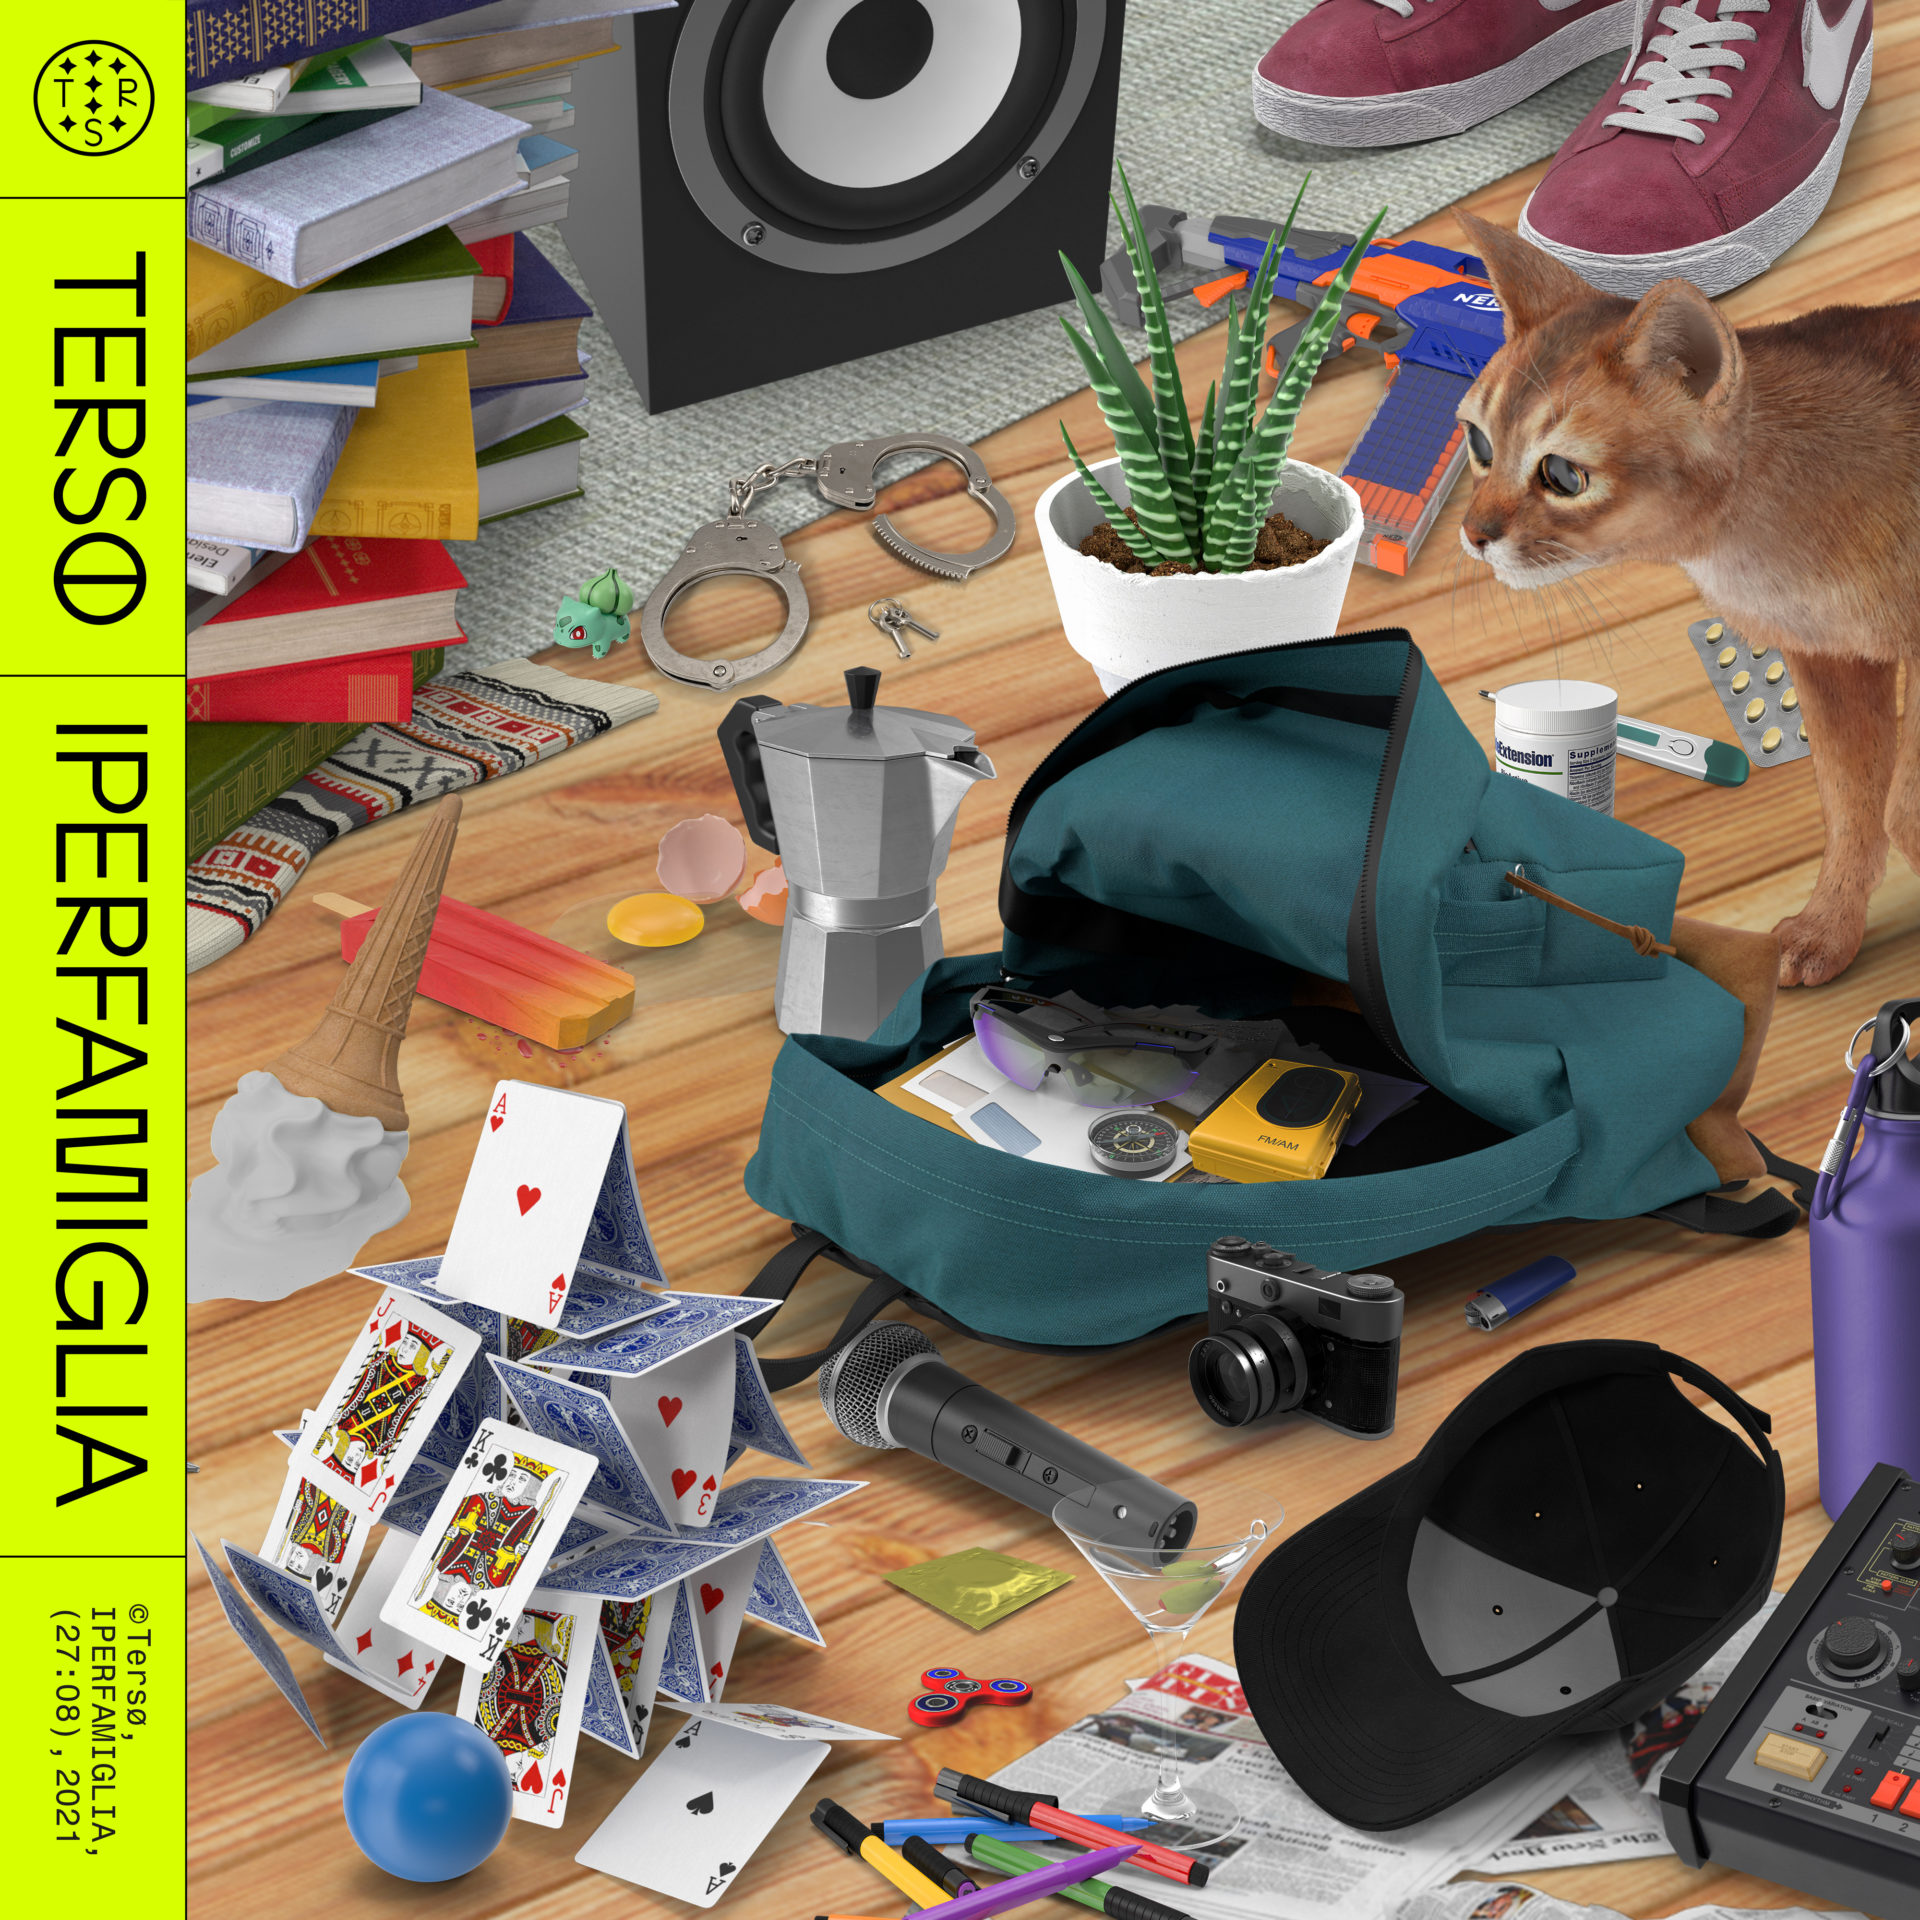 Iperfamiglia cover album Terso by @studioframes